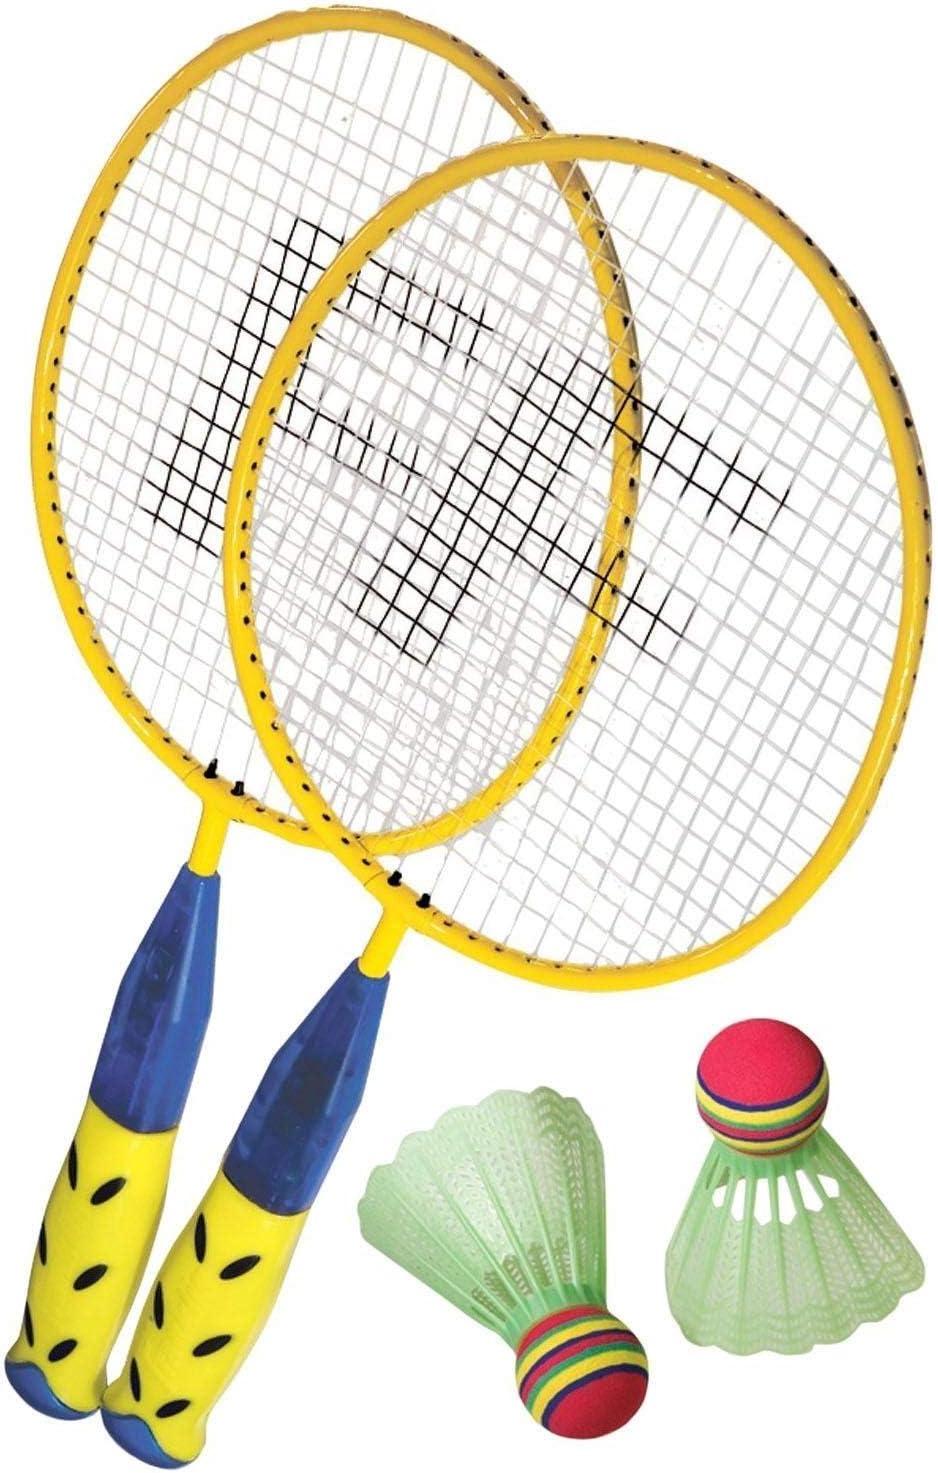 Franklin Sports Grip-Rite Smashminton Set Renewed